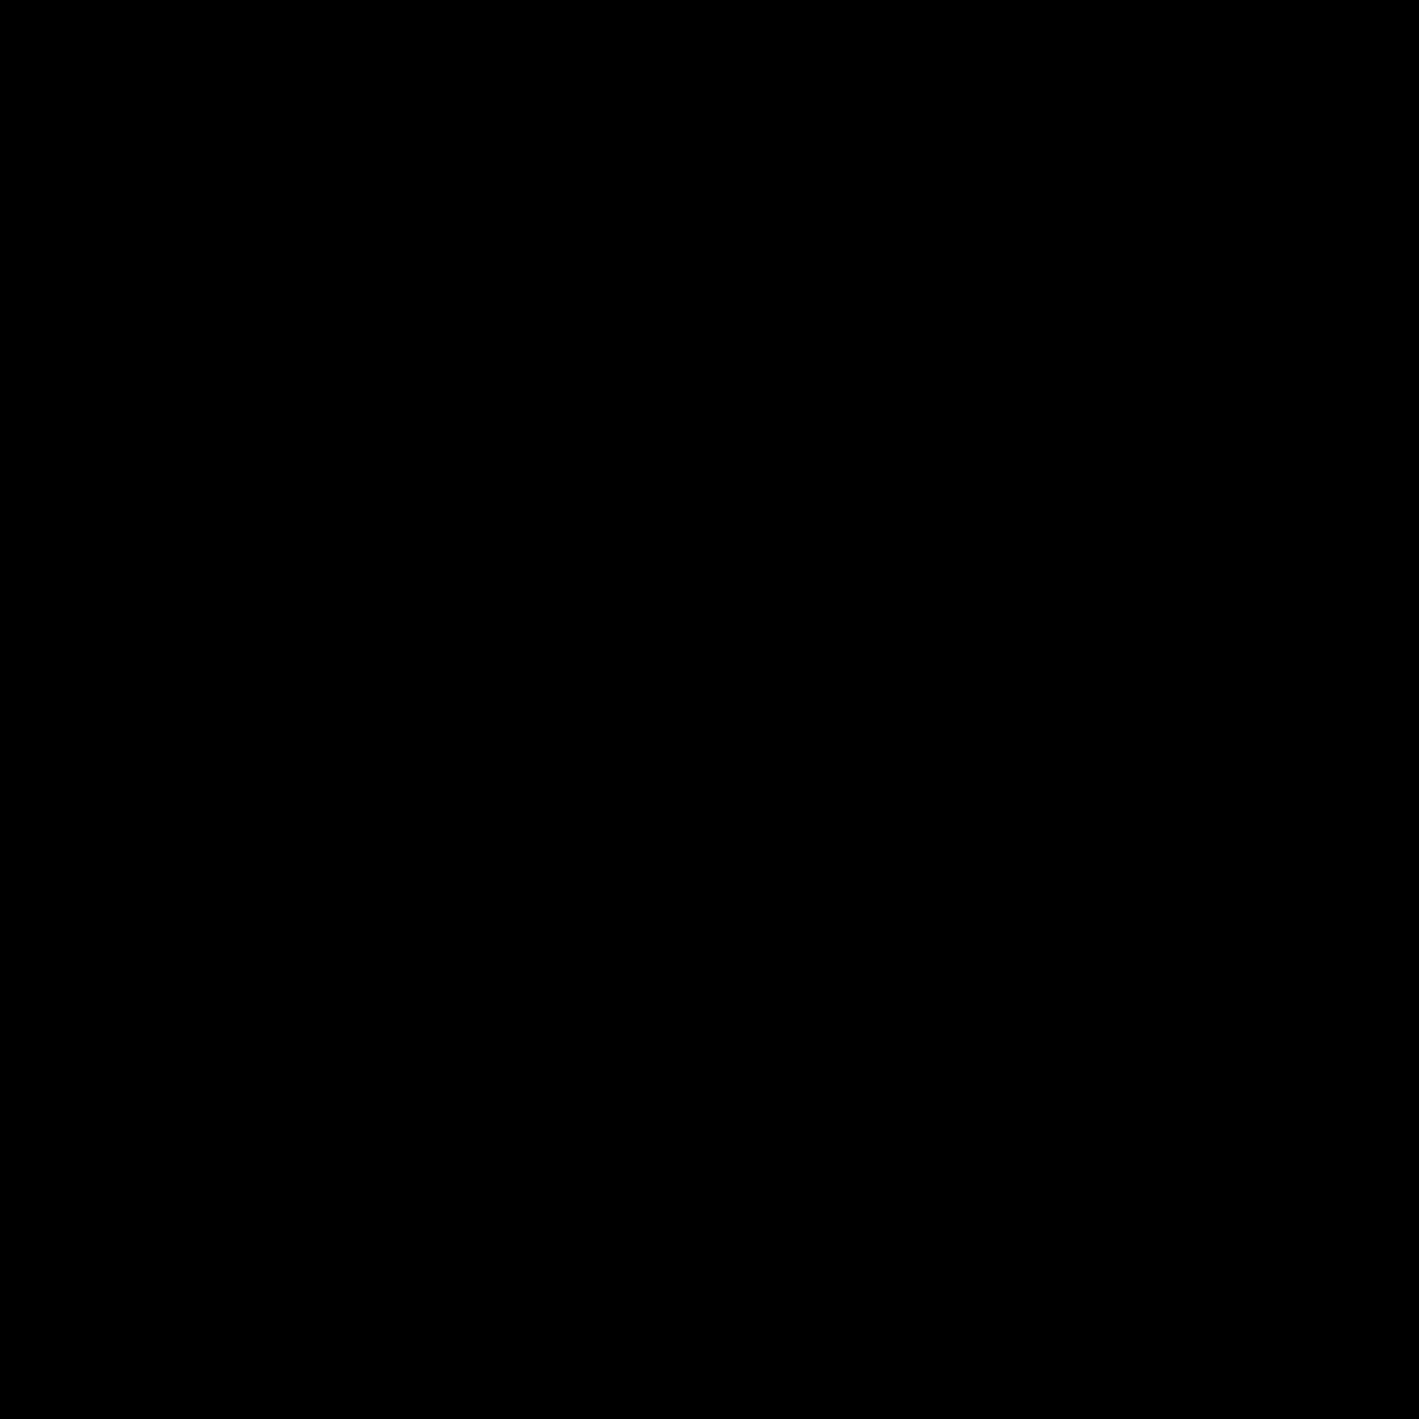 image for james bond 007 logo wallpaper desktop #eucit | bond